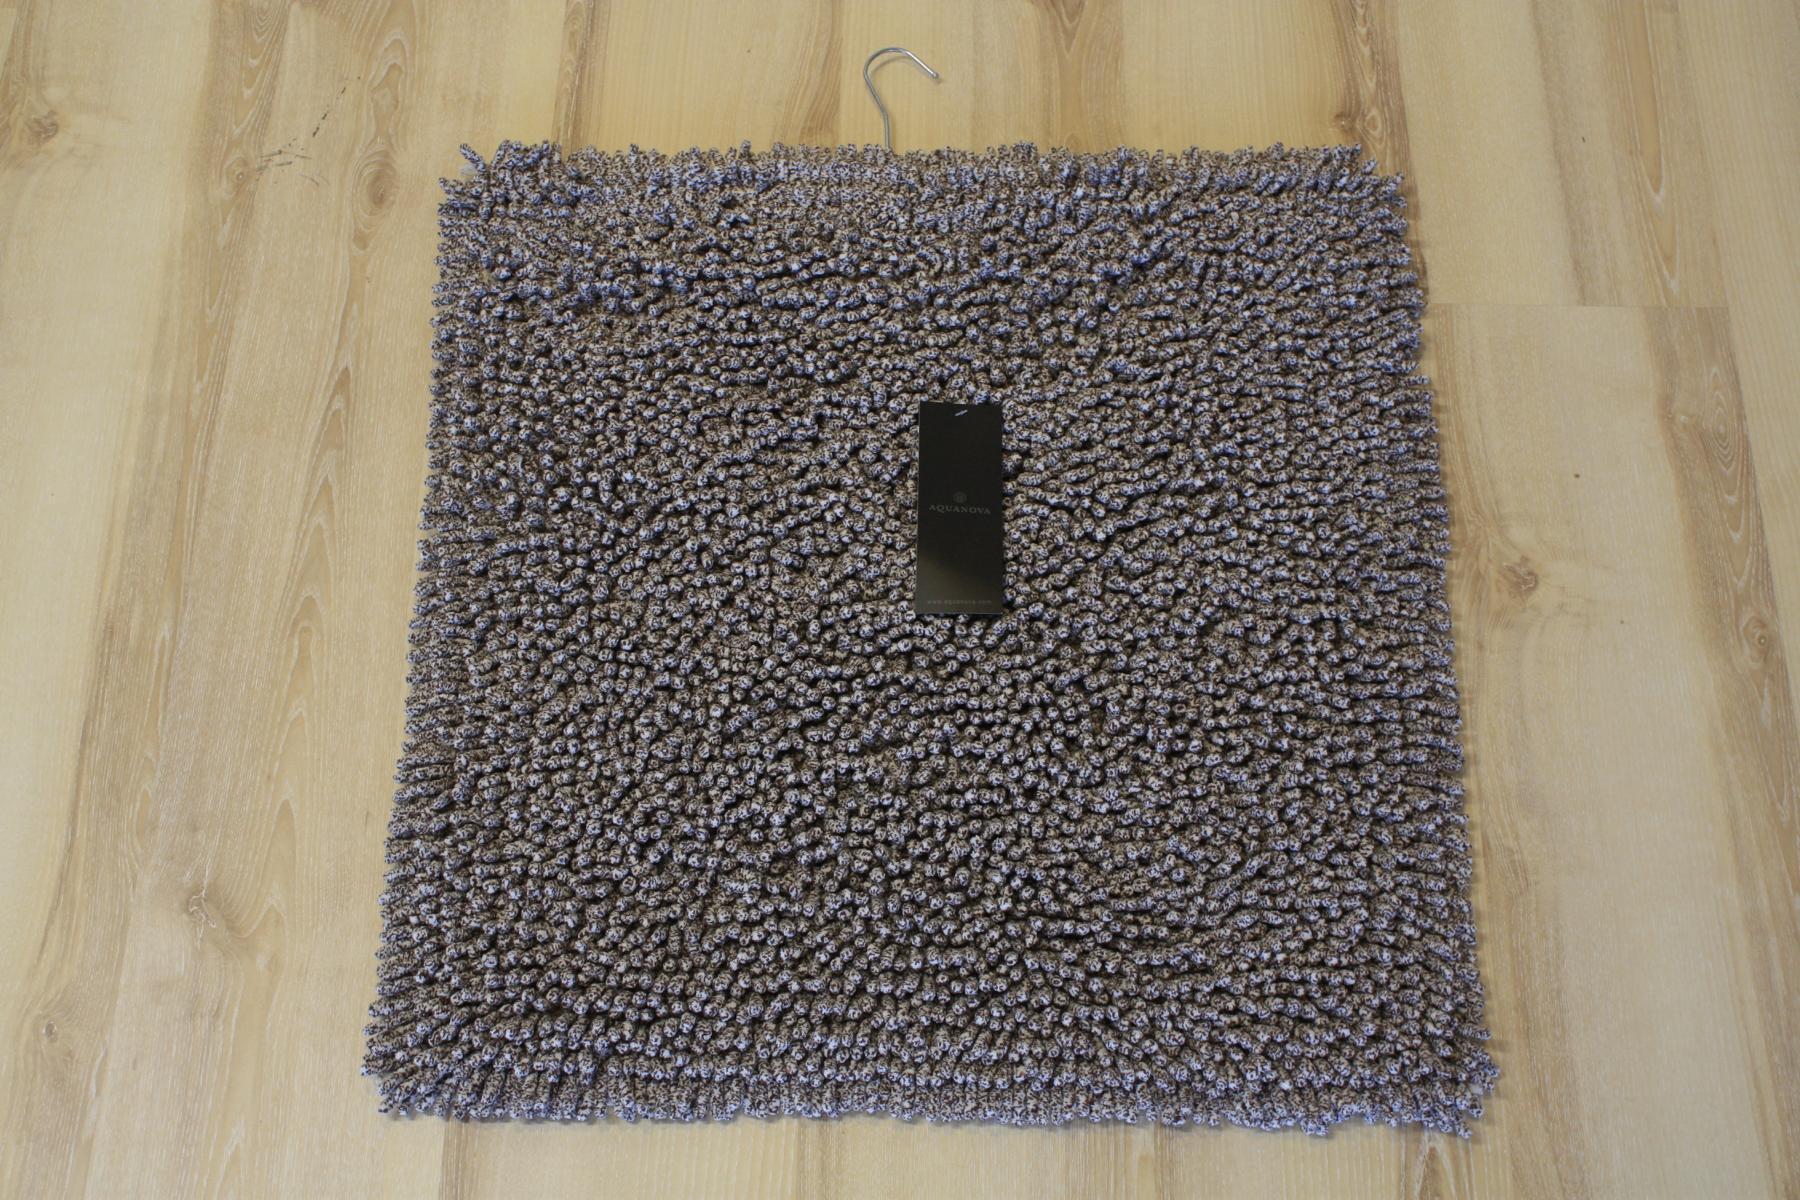 badteppich aquanova elvira 12 sand 60x60cm beige ebay. Black Bedroom Furniture Sets. Home Design Ideas